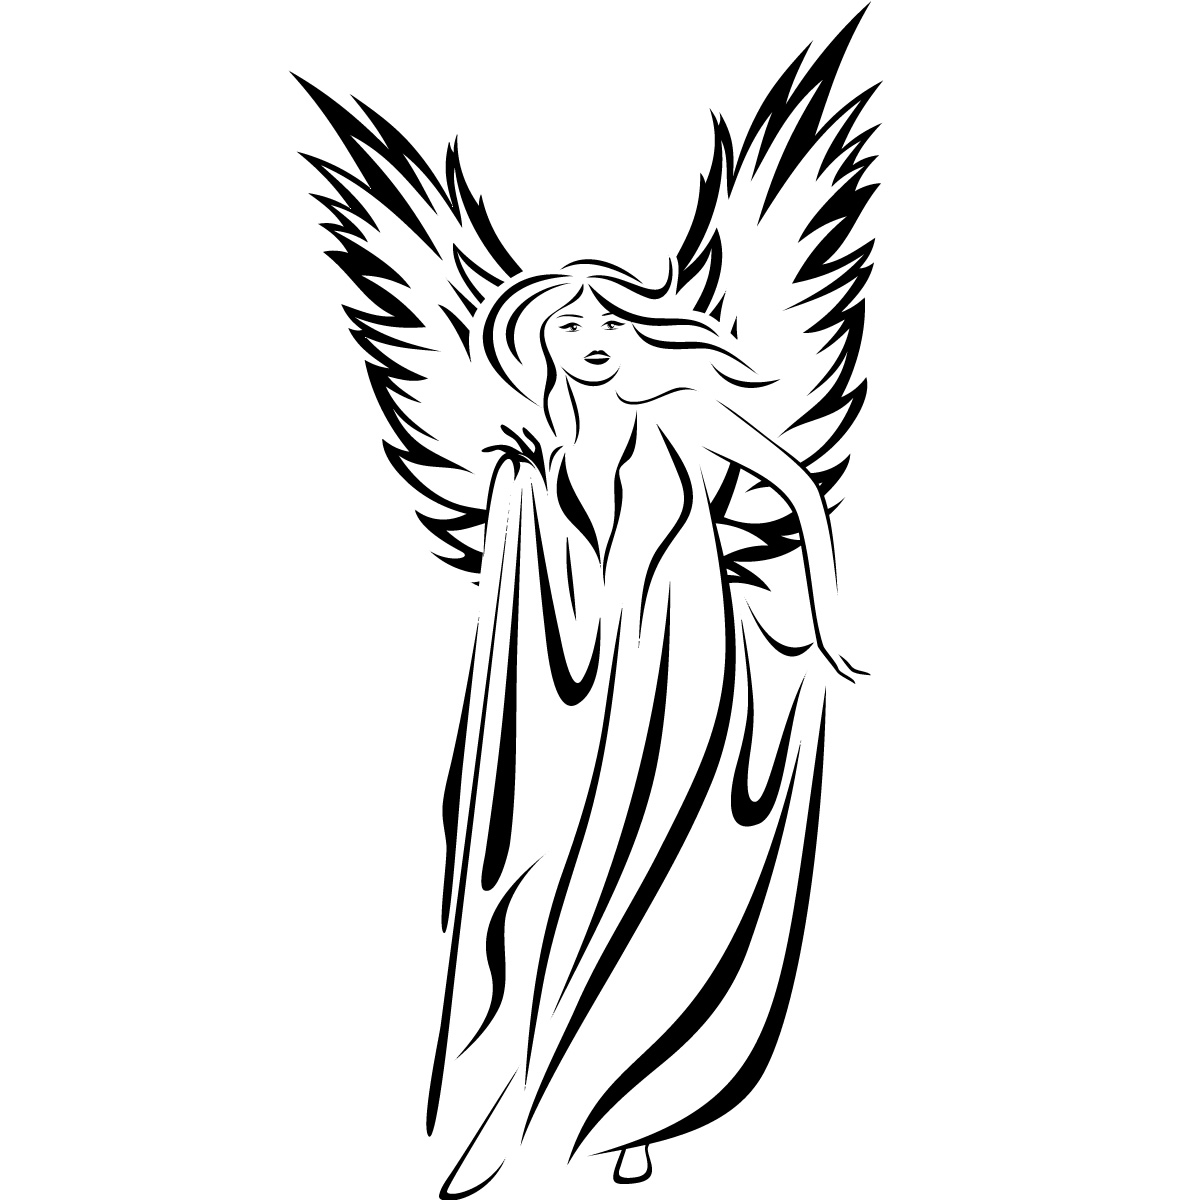 Line Art Angel : Angel line drawings clipart best